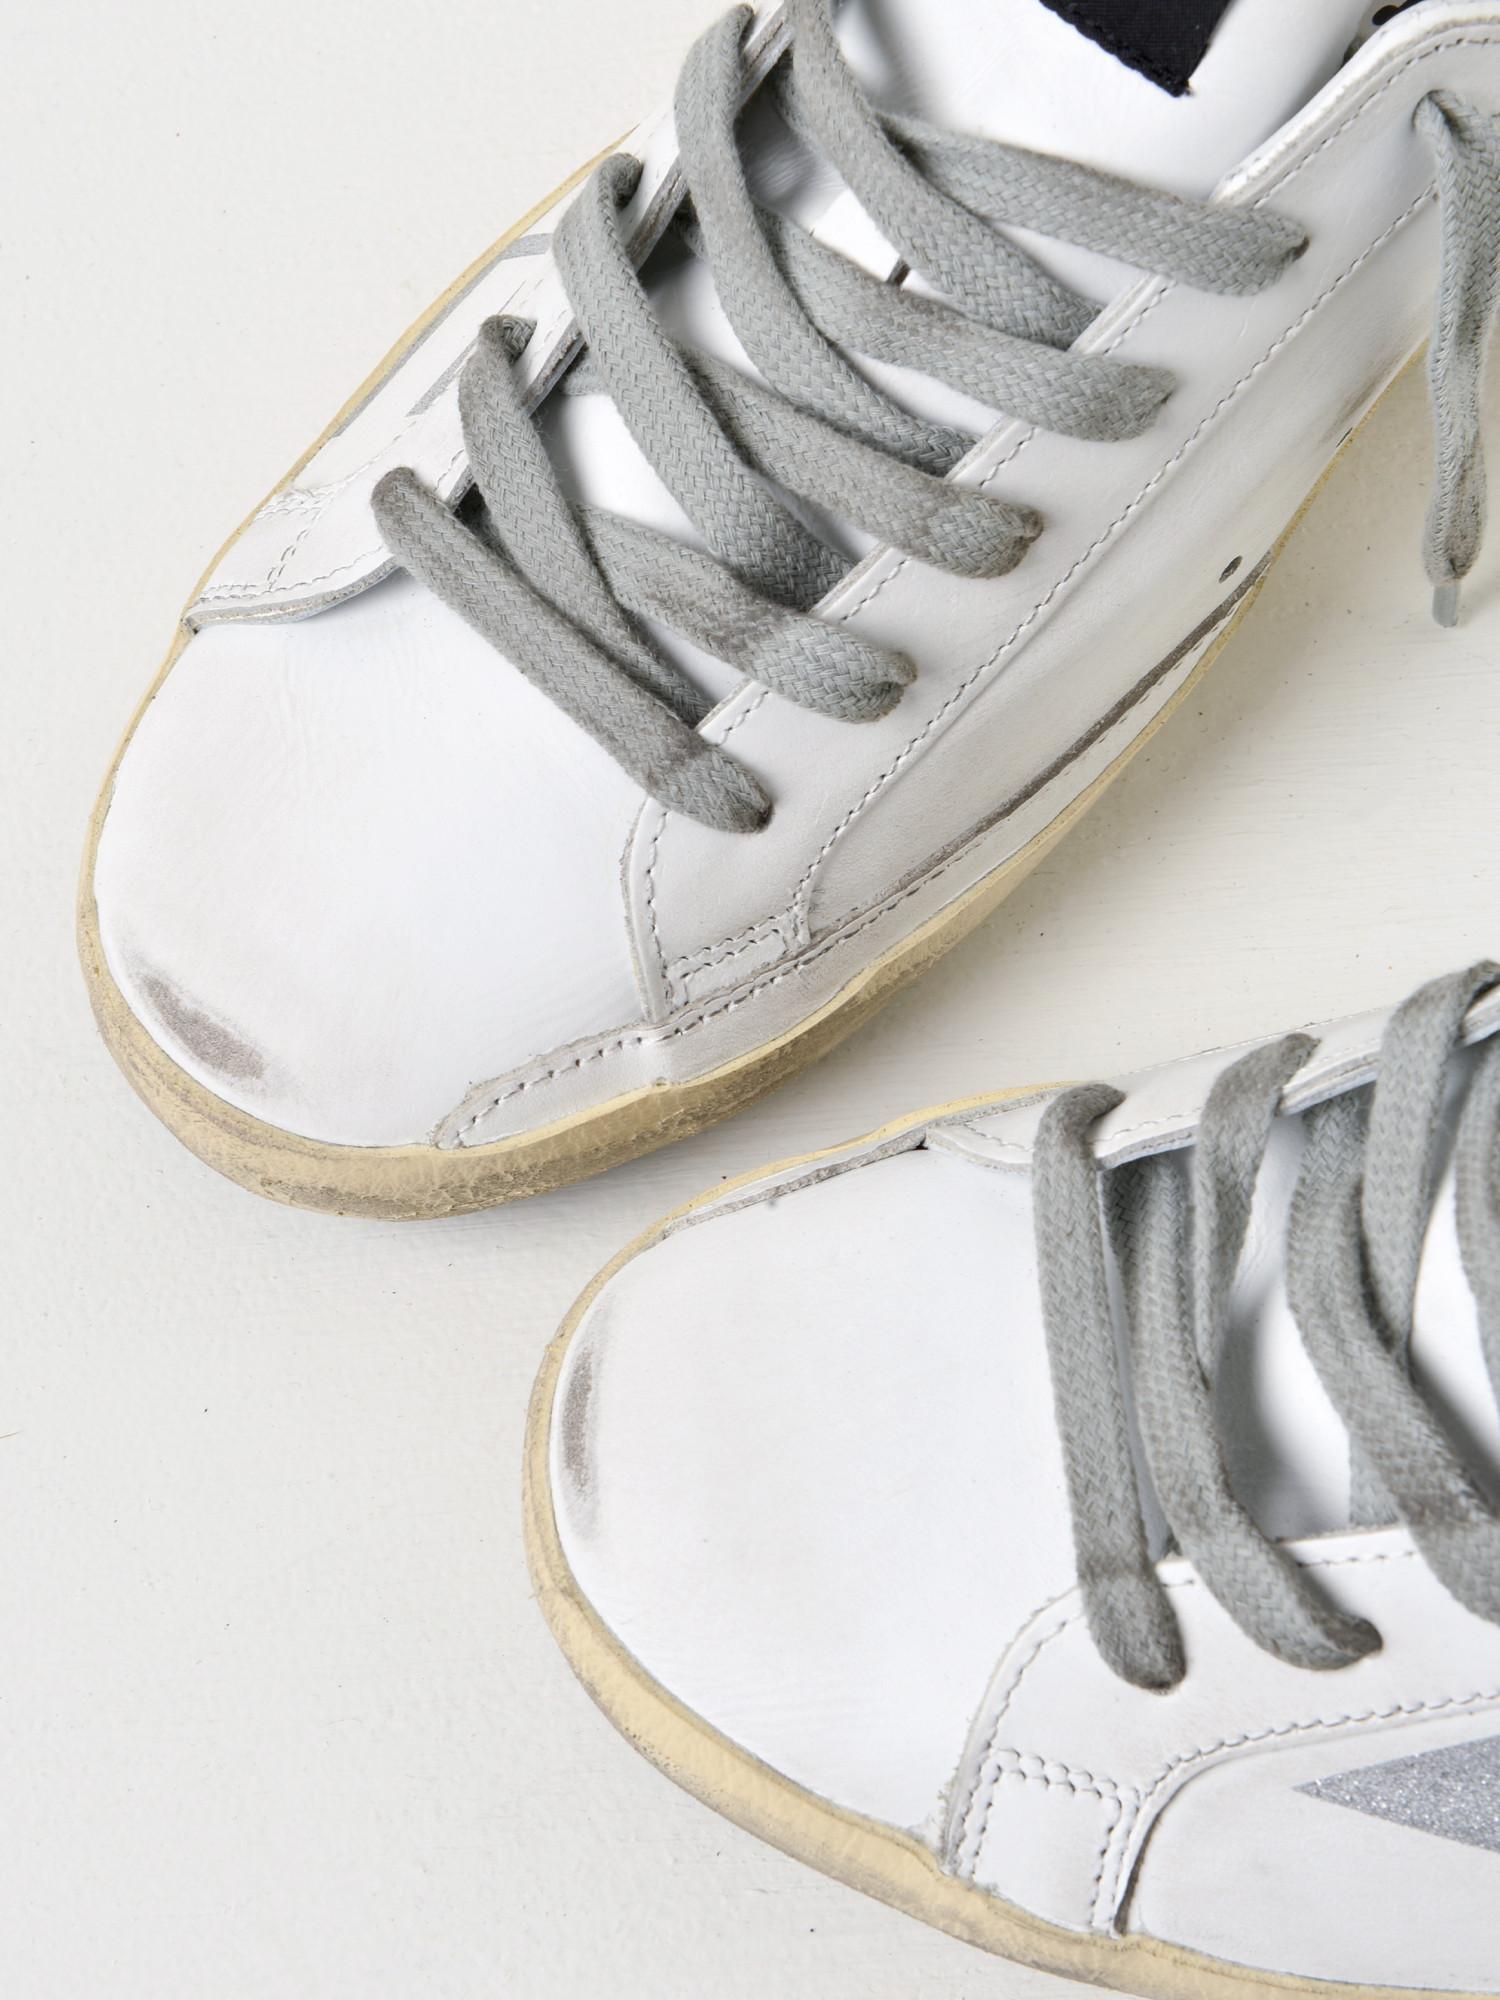 1ed57971c19 Lyst - Golden Goose Deluxe Brand Sneakers Superstar  white Leather Silver  Glitter in Metallic for Men